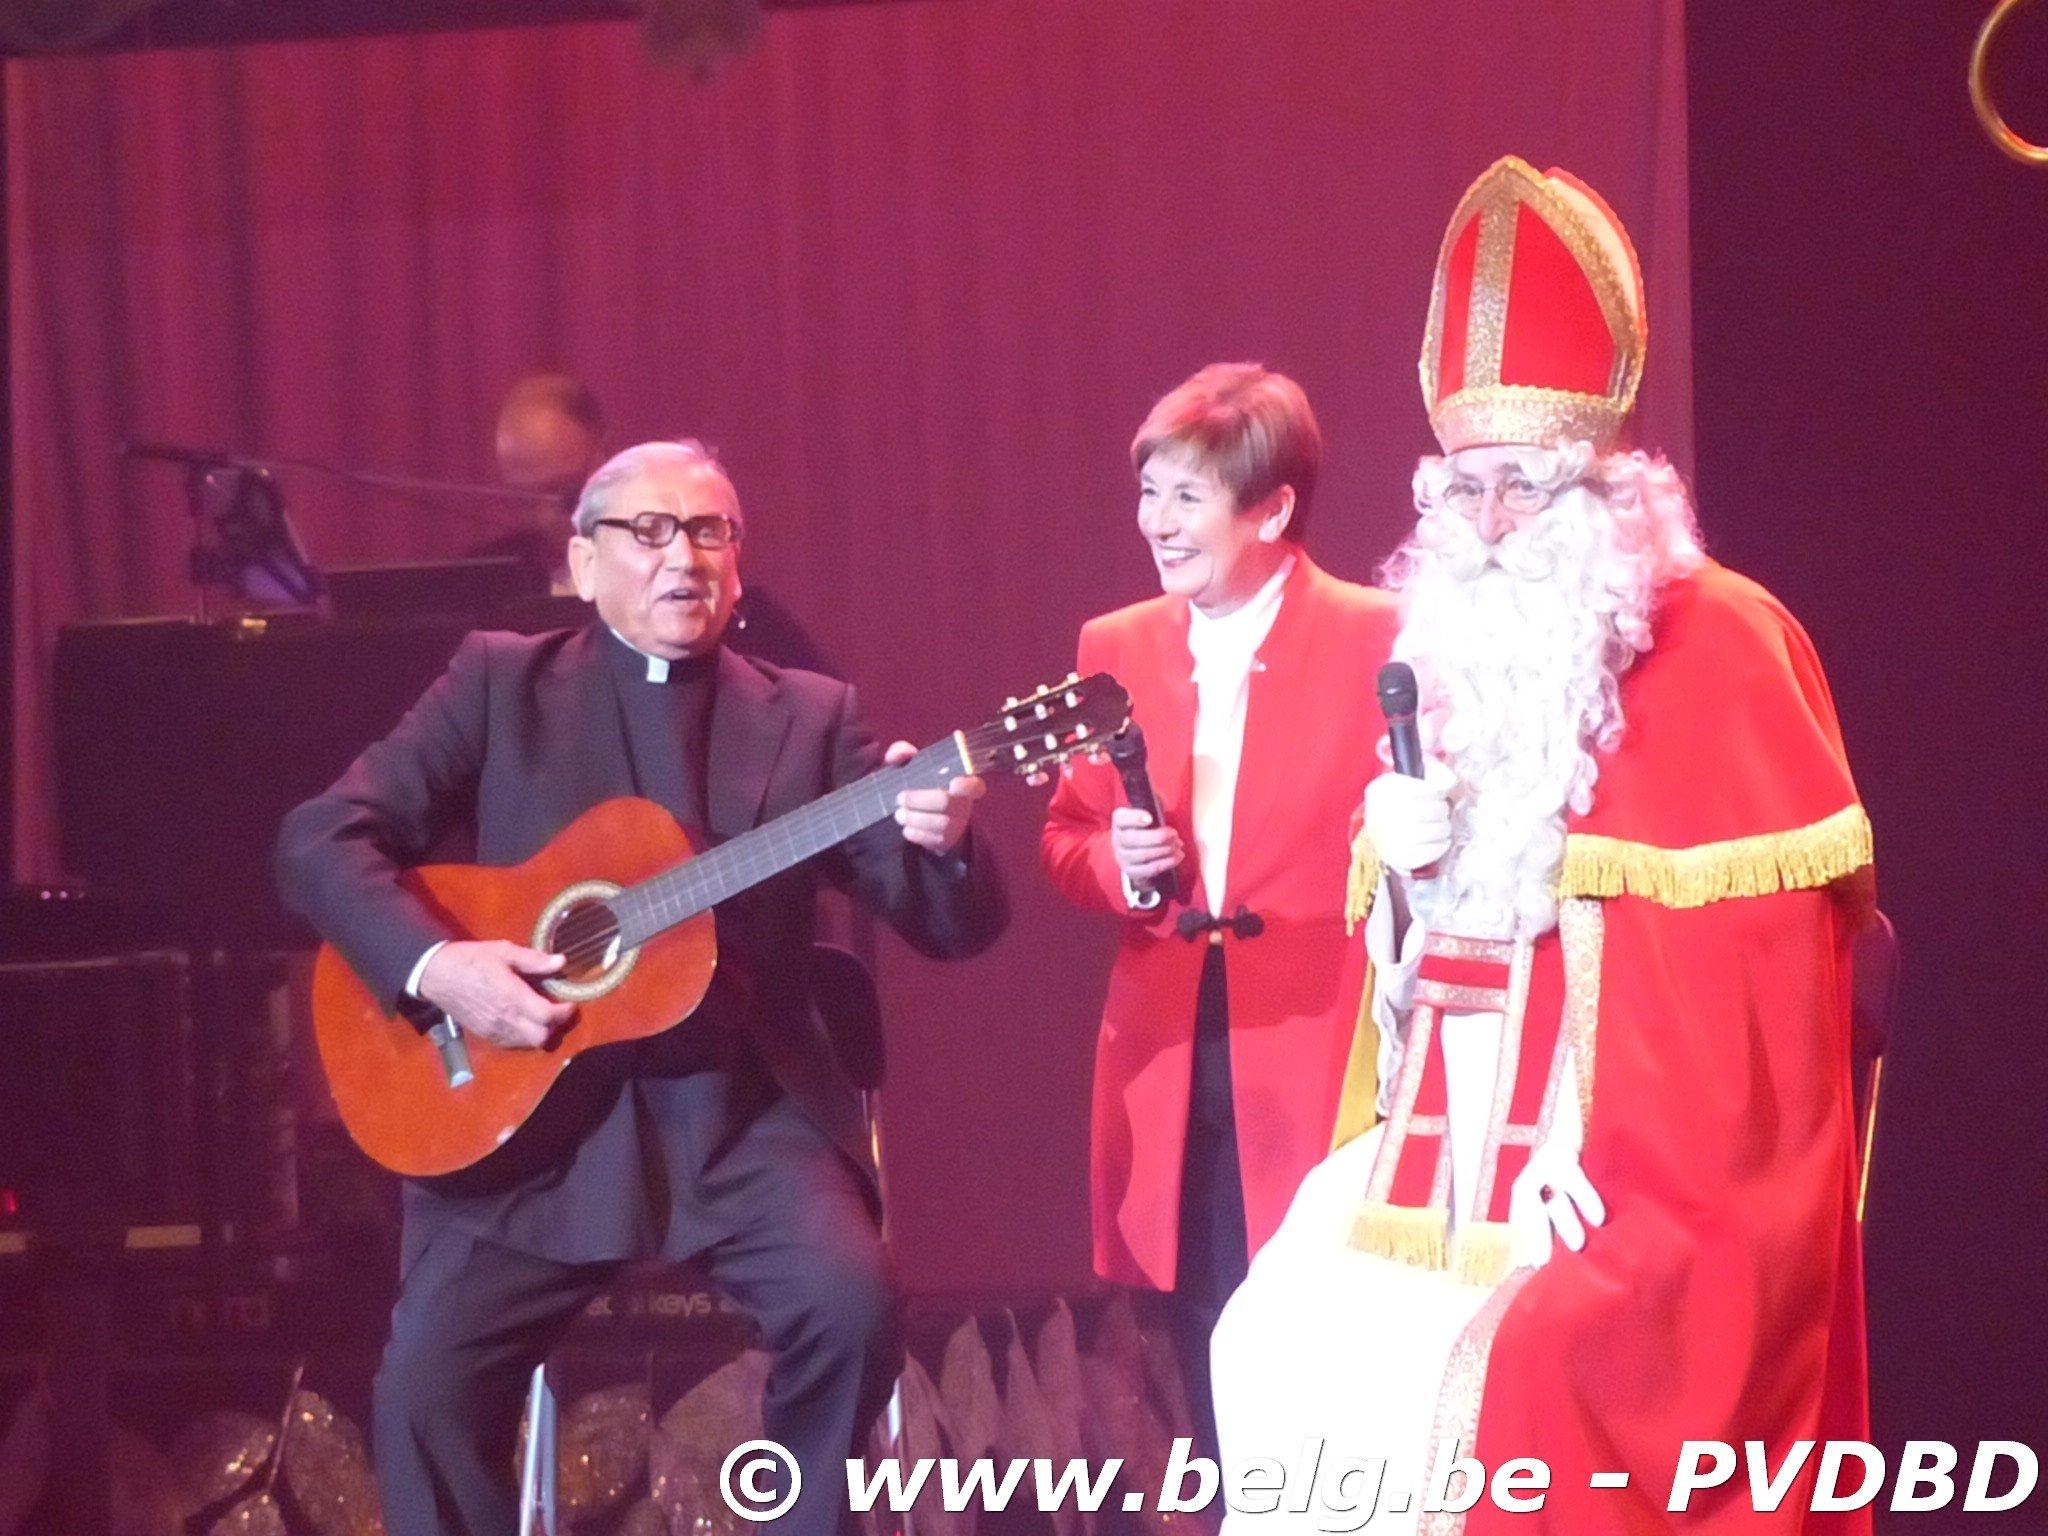 Sint vergeet Dilbeekse senioren niet - P1110828